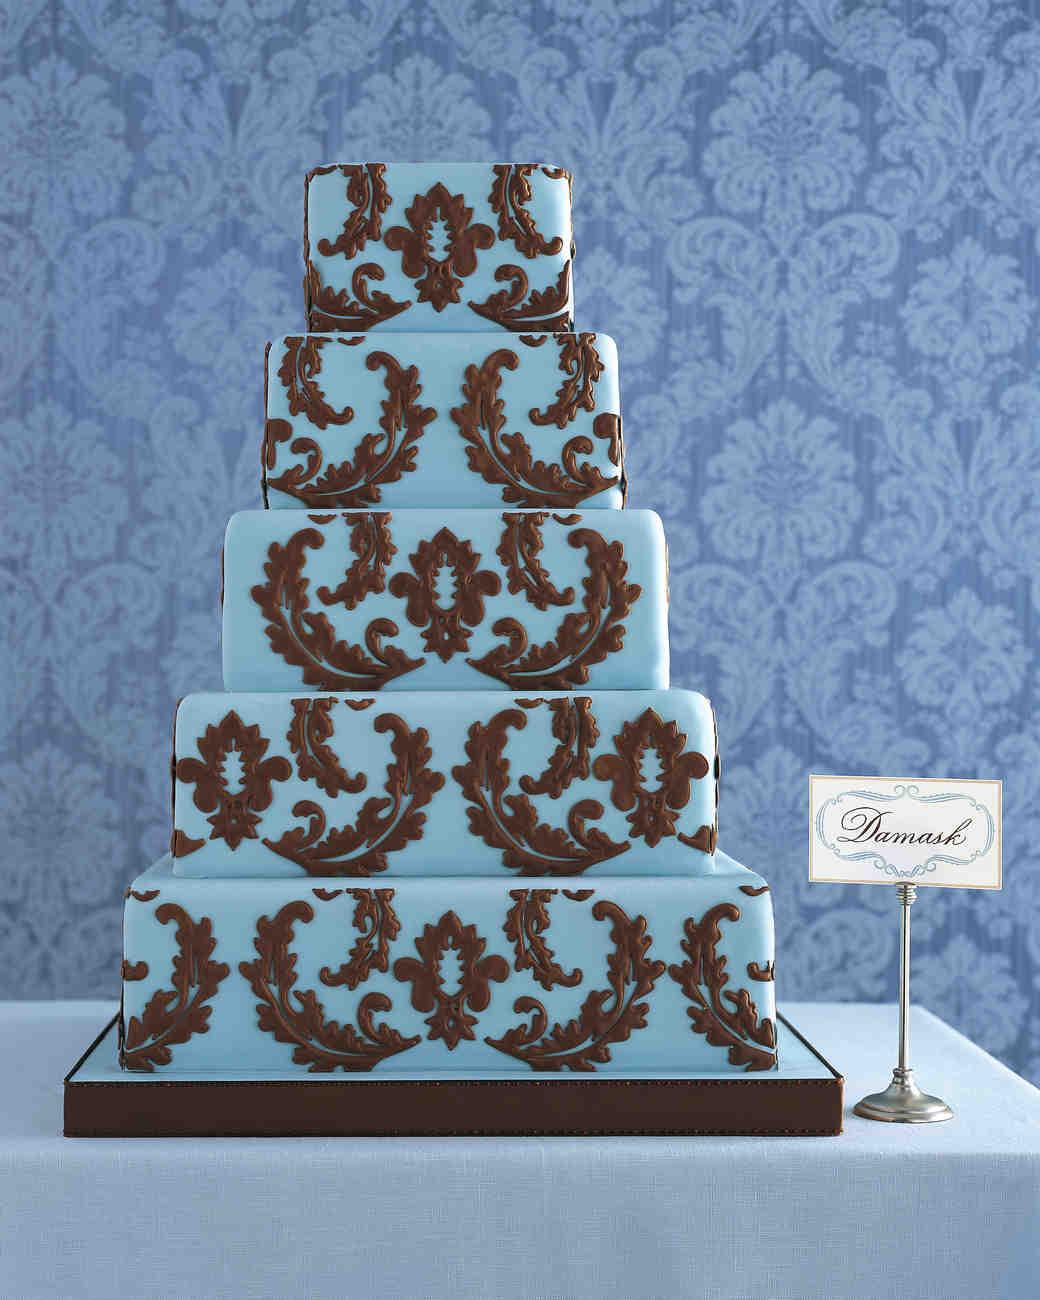 chocolate-cake-ideas-mw0405wela8-damask-1114.jpg